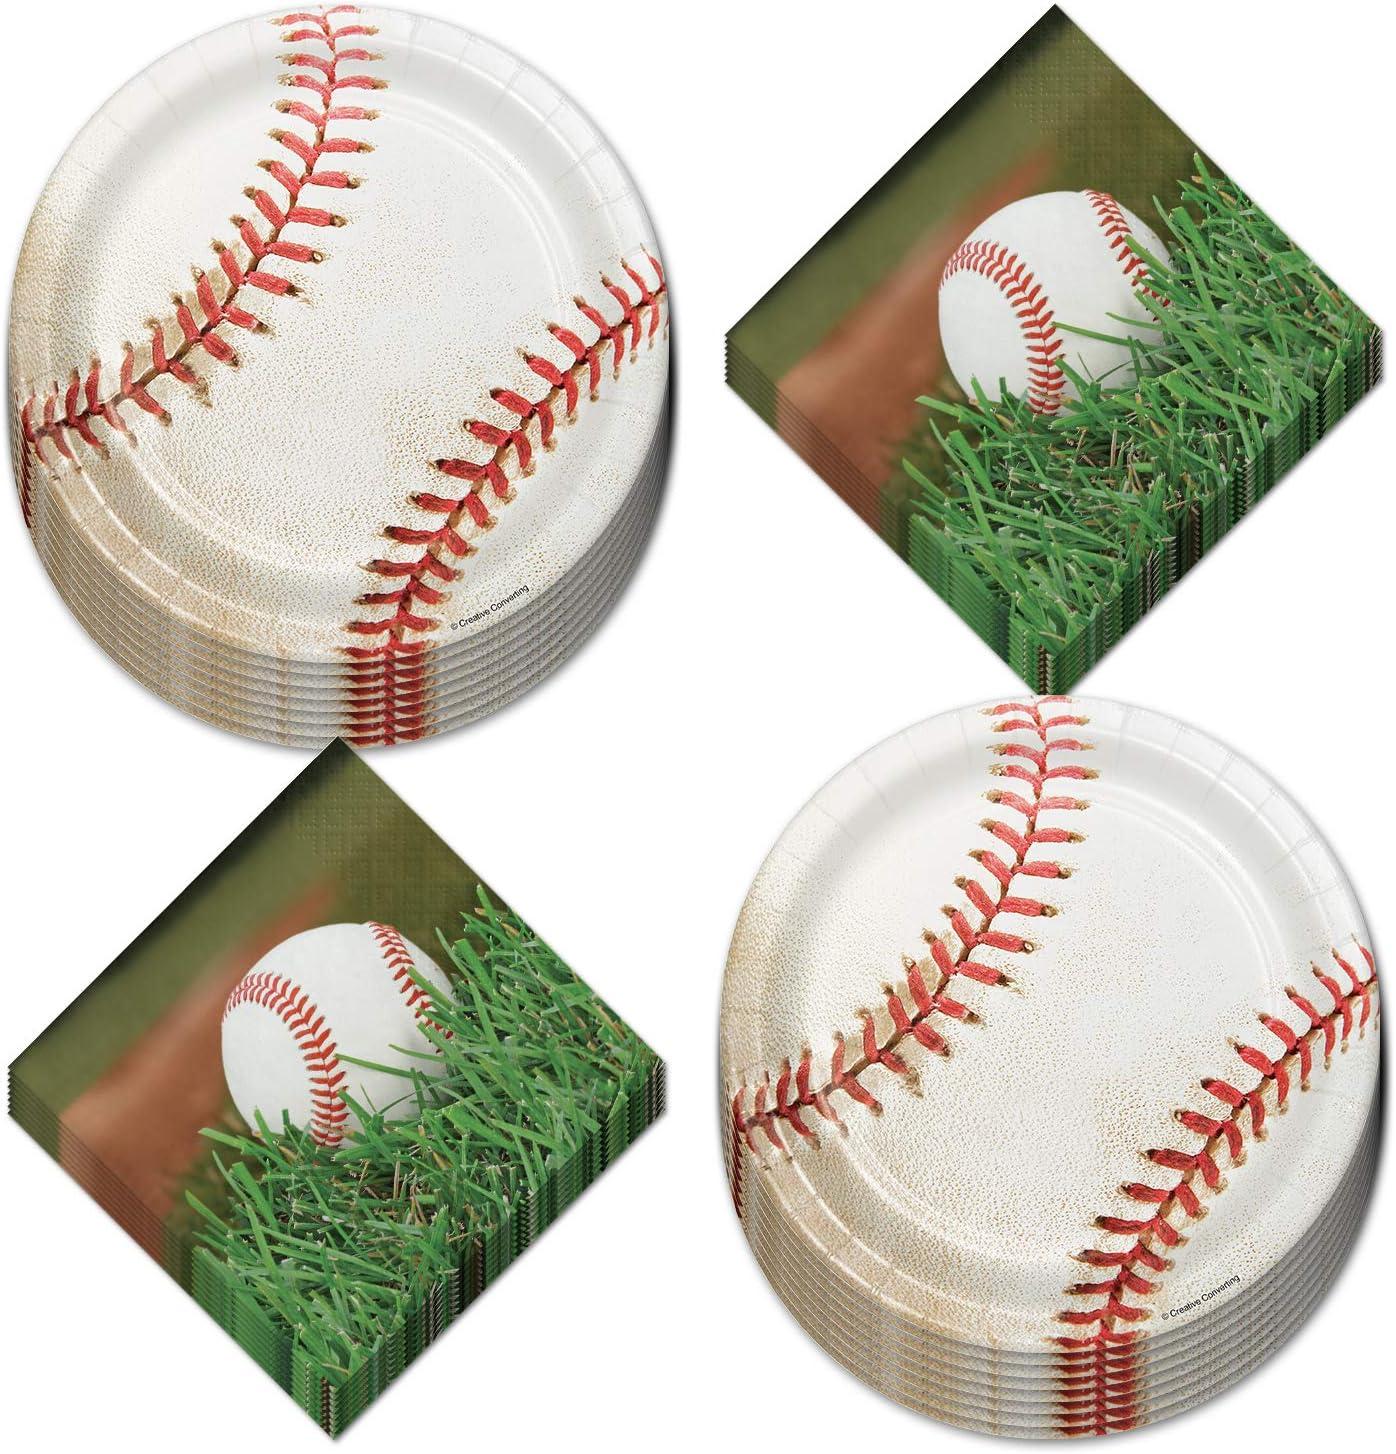 Baseball Party Supplies - Dessert Plates and Napkins (Serves 16)